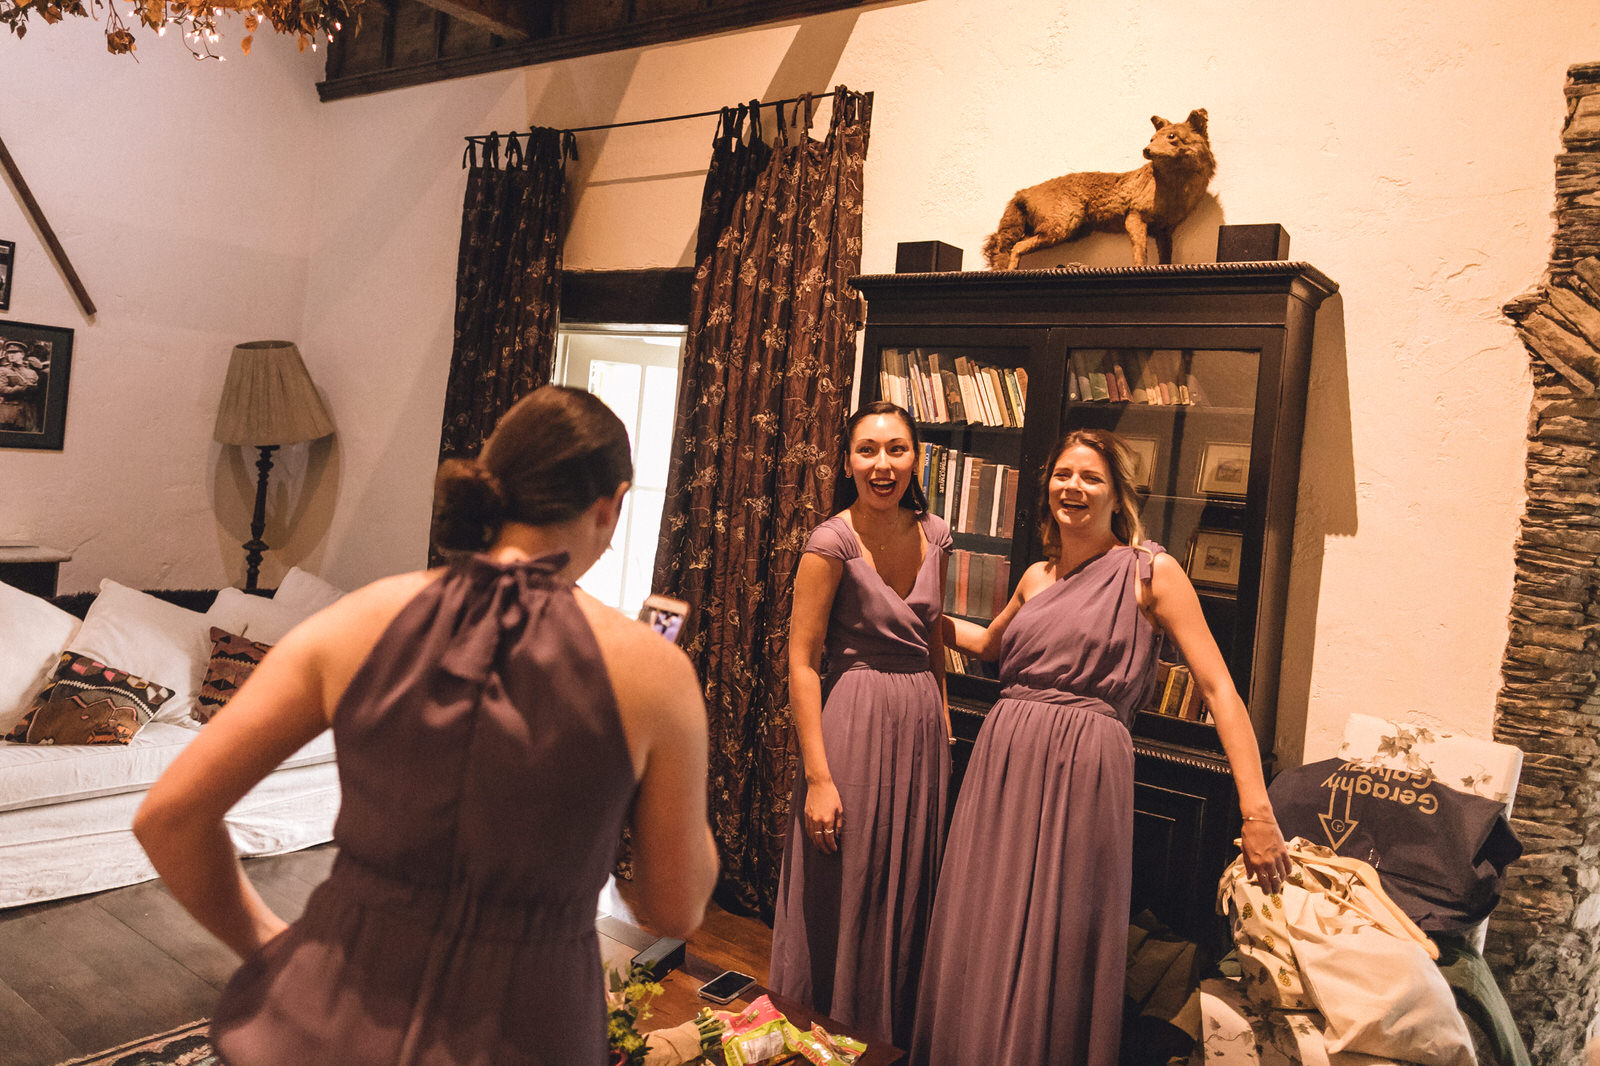 Balybeg-house-ireland-wicklow-wedding-photographer-roger-kenny_greystones030.jpg